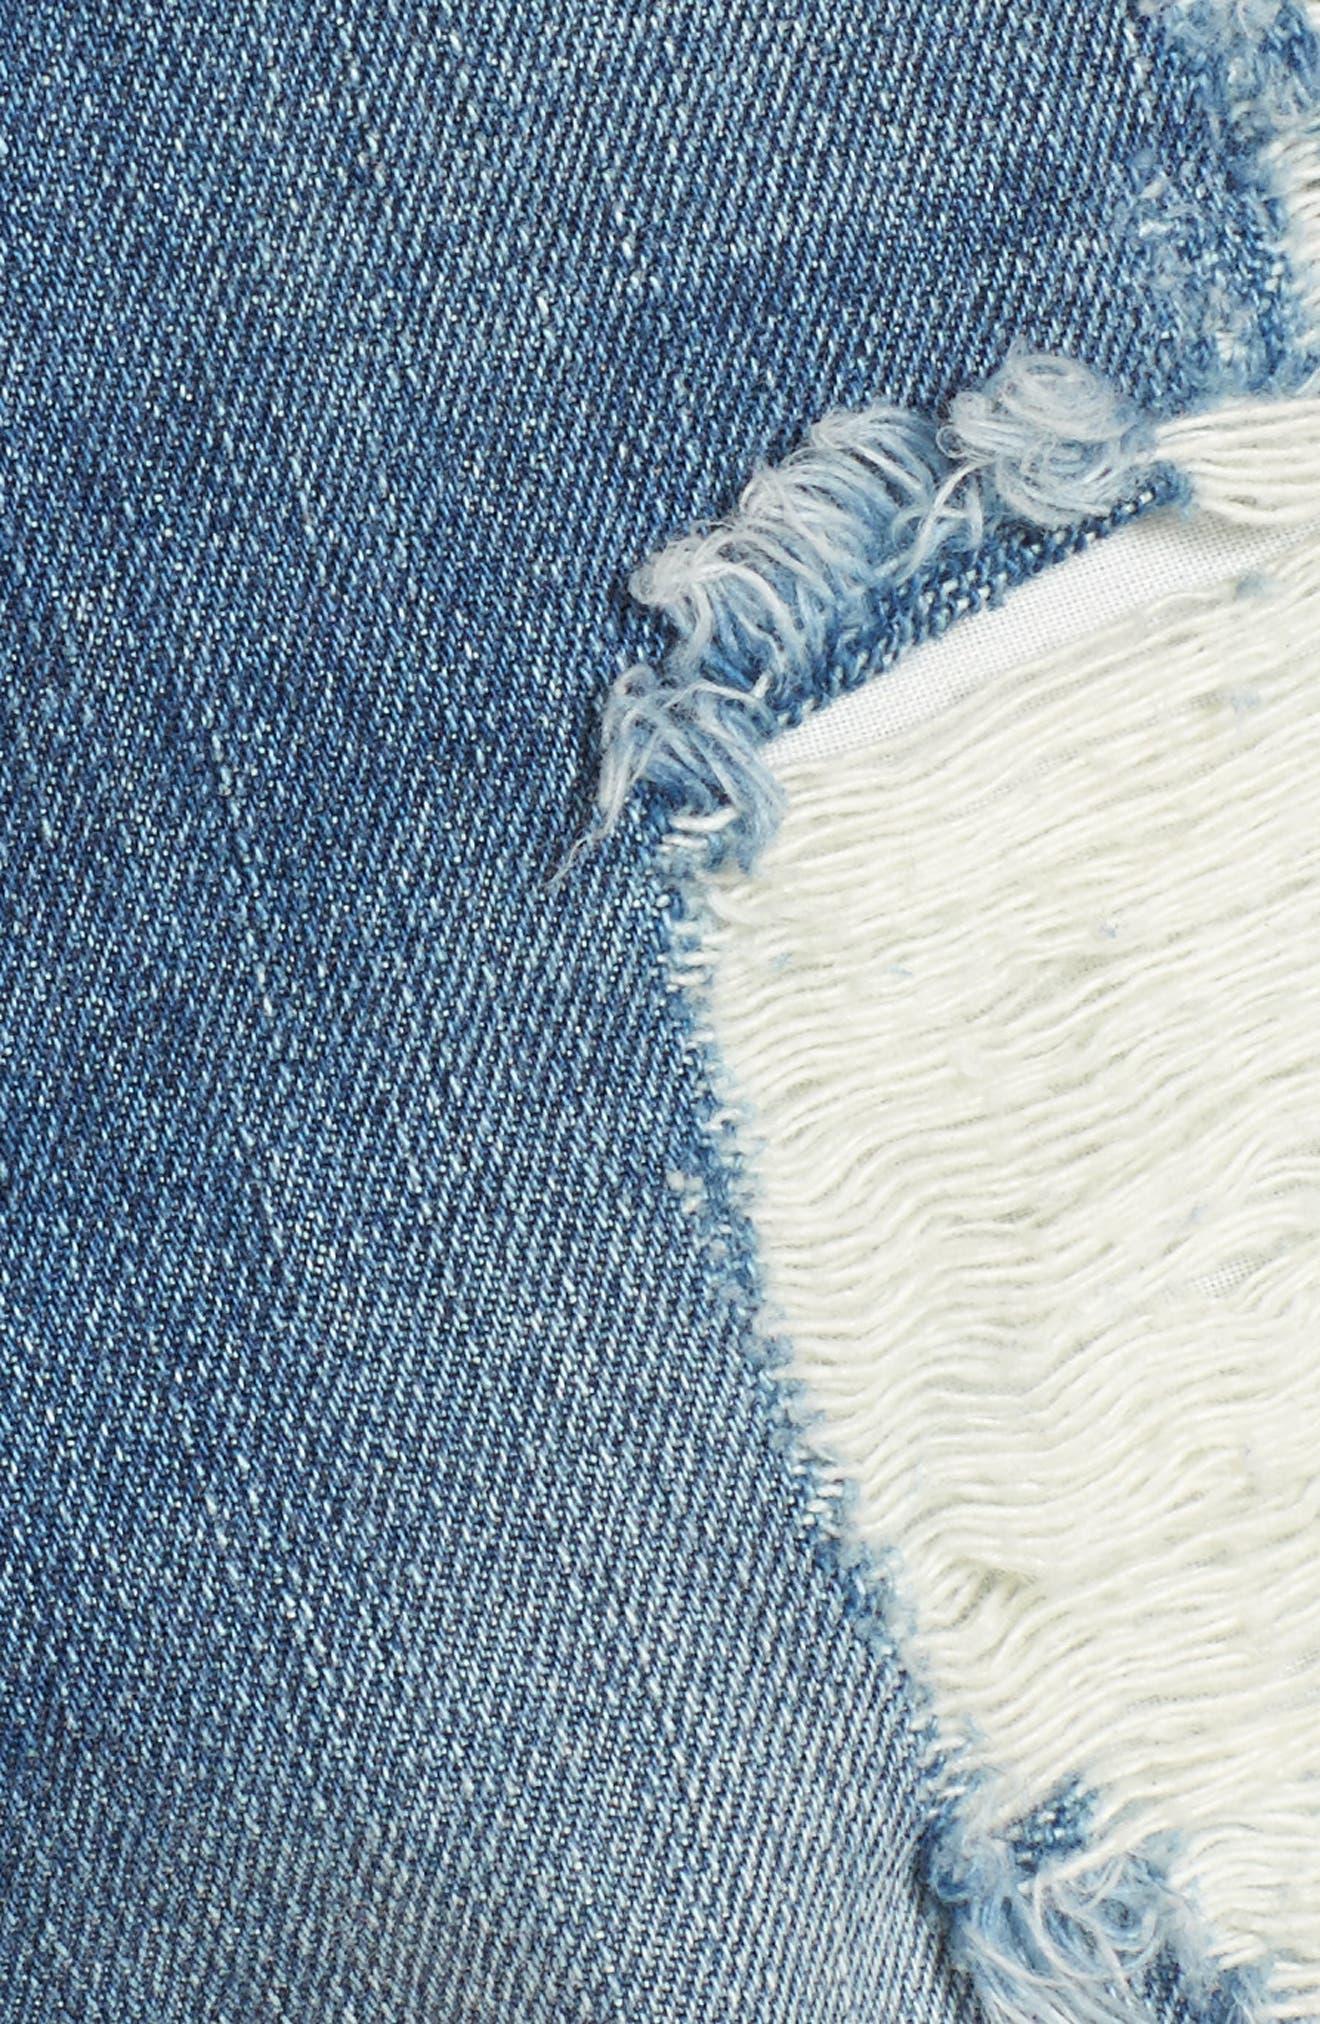 Wyoming High Waist Cutoff Denim Shorts,                             Alternate thumbnail 5, color,                             400